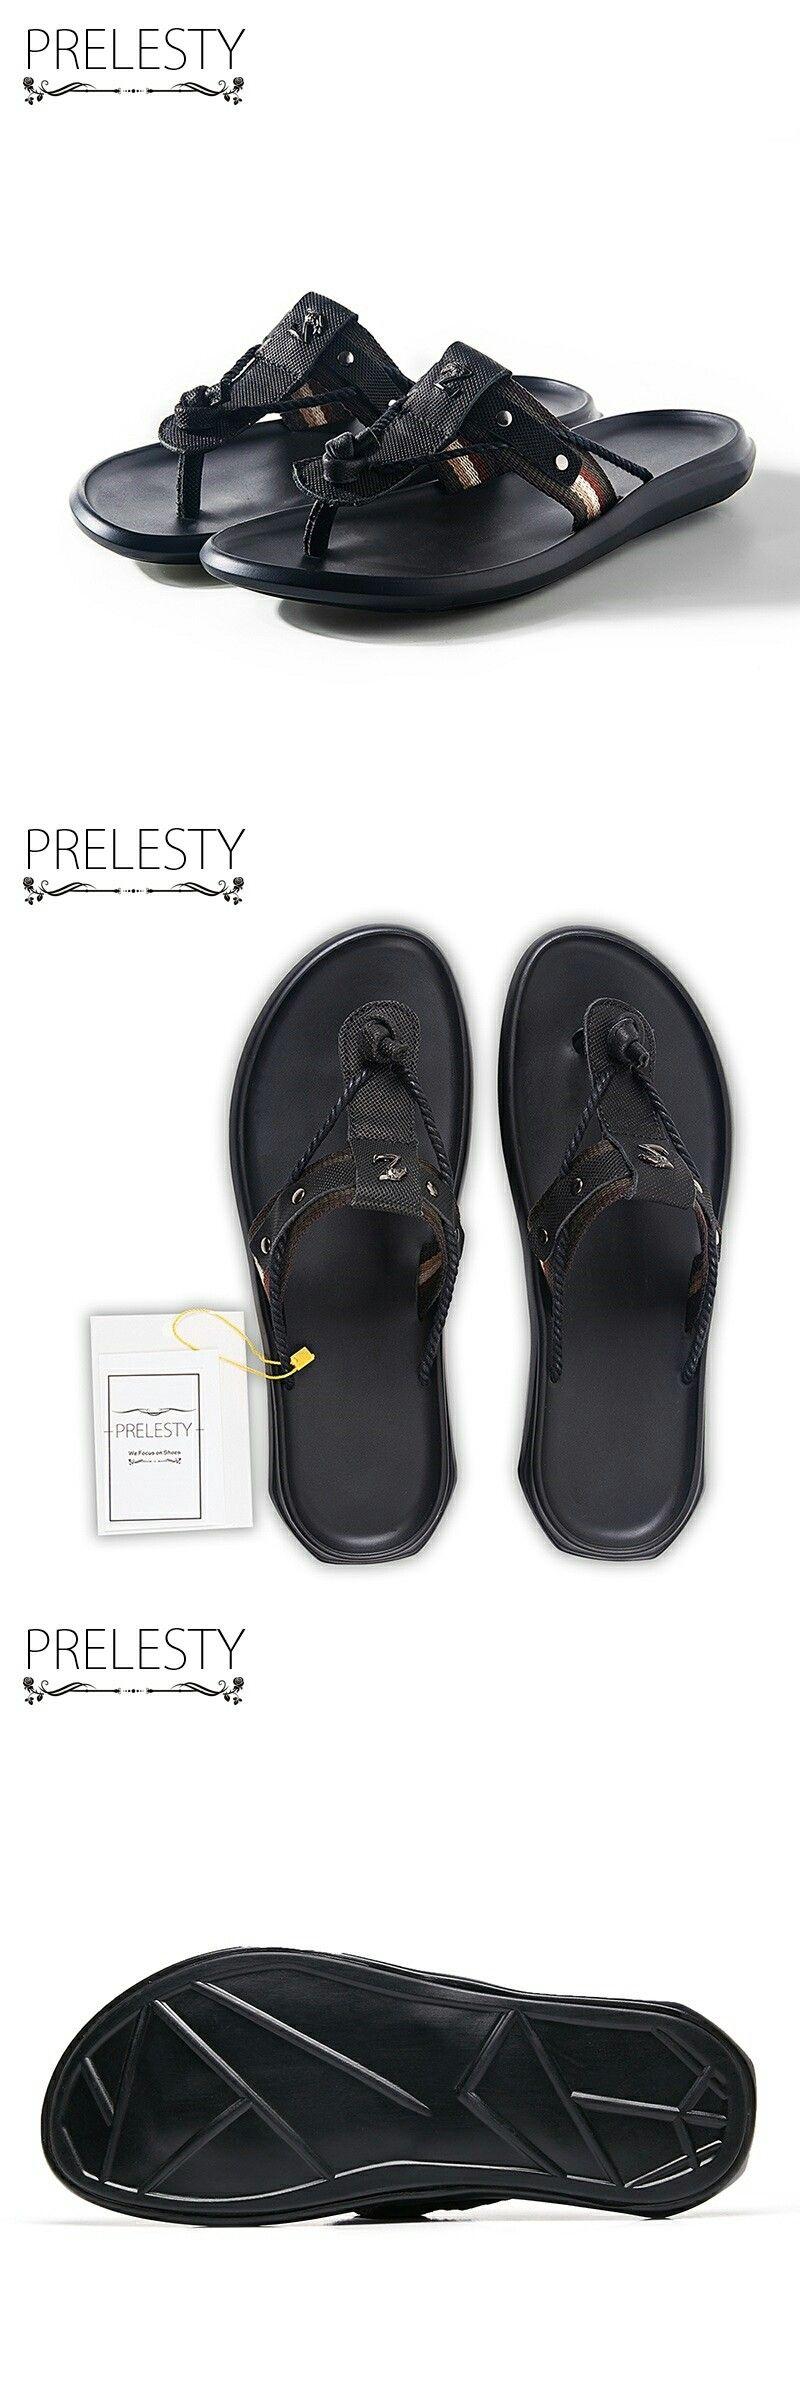 US 27.01 Prelesty Men Flip Flops Top Quality Material